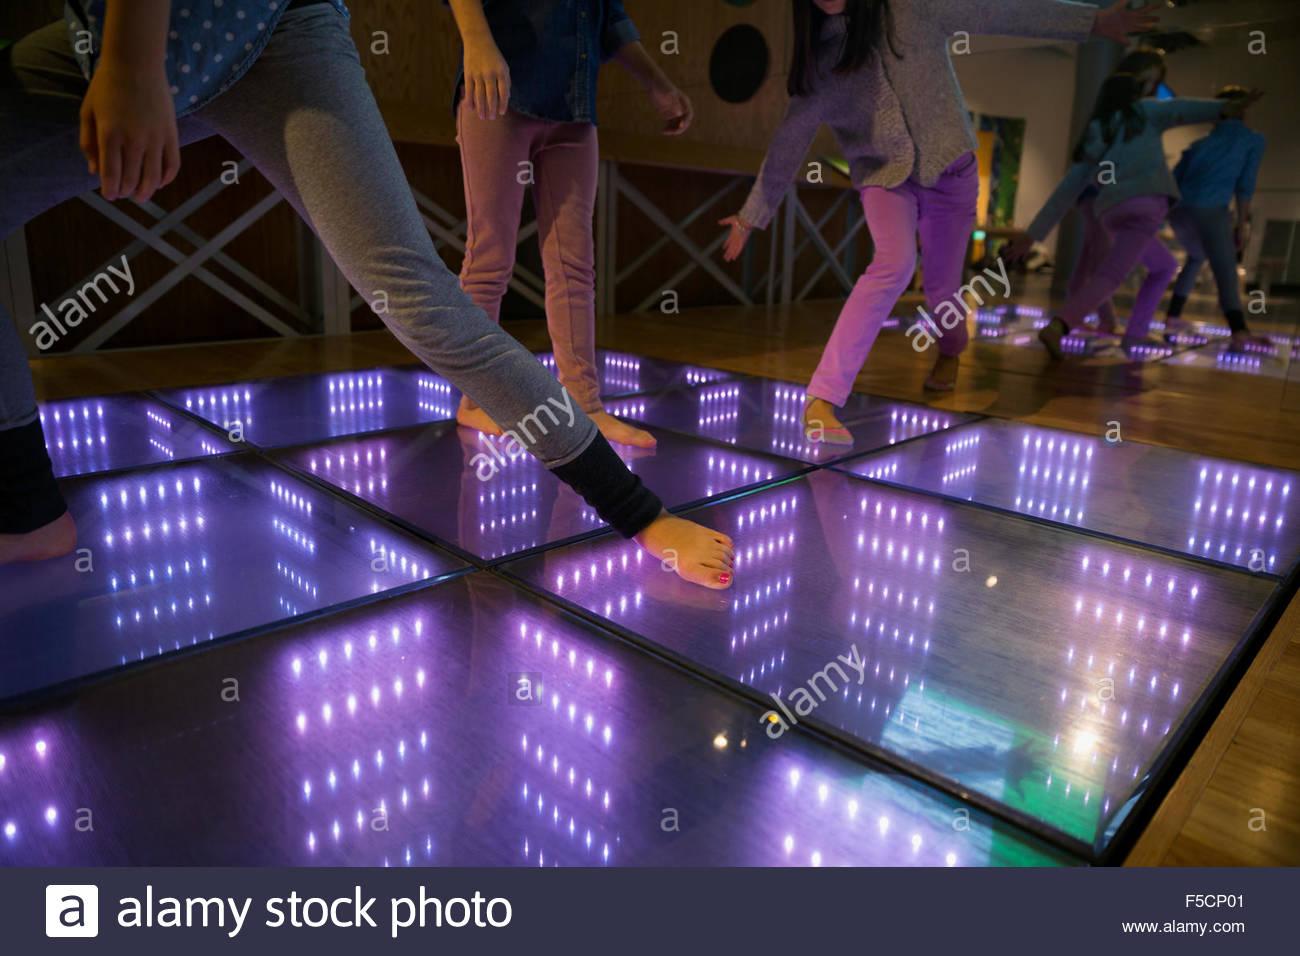 Barefoot girls dancing illuminated floor science center exhibit - Stock Image